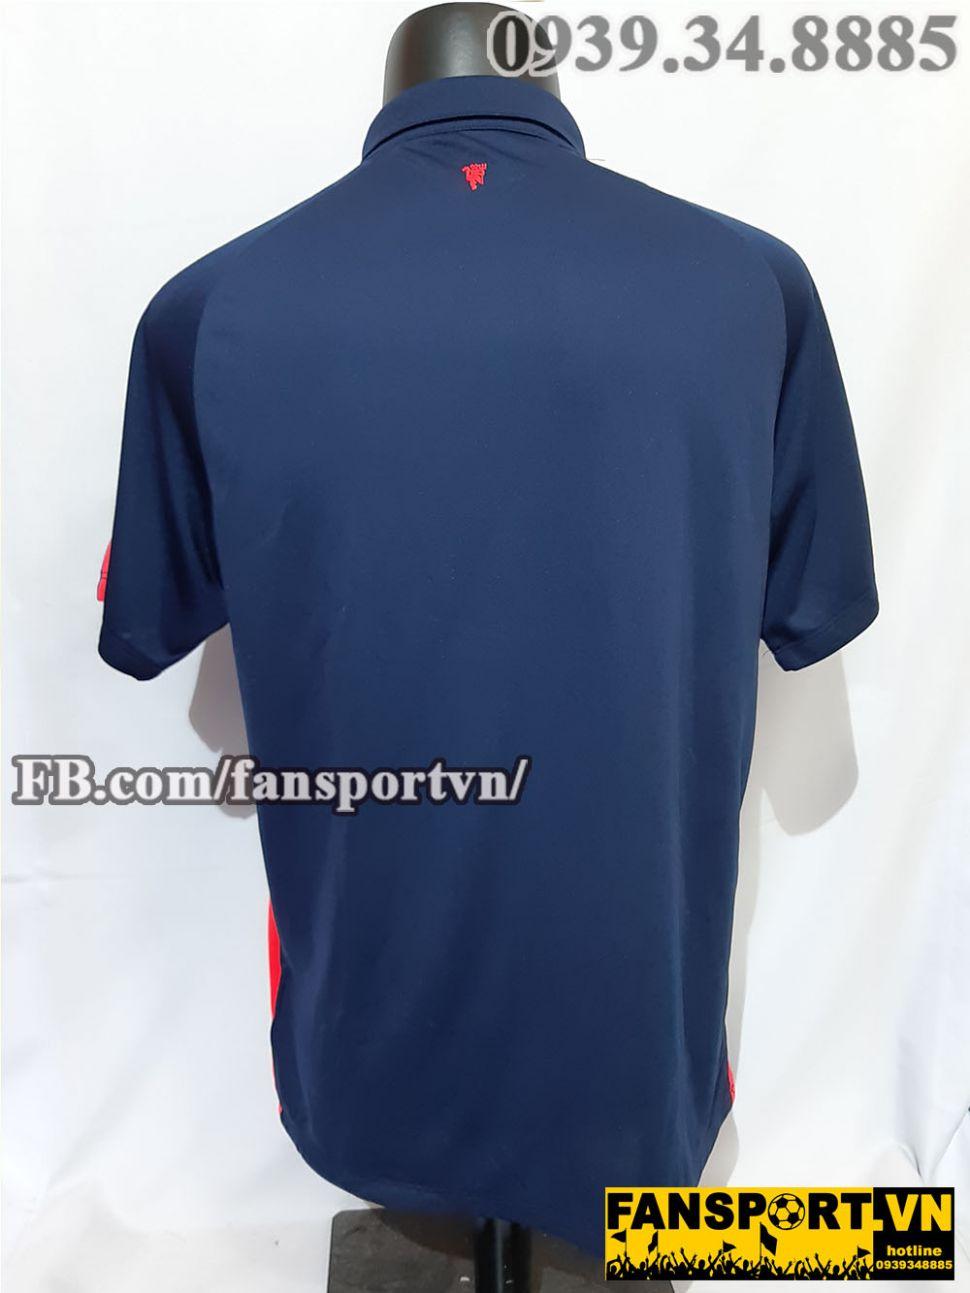 Áo đấu Manchester United 2014-2015 third shirt jersey blue